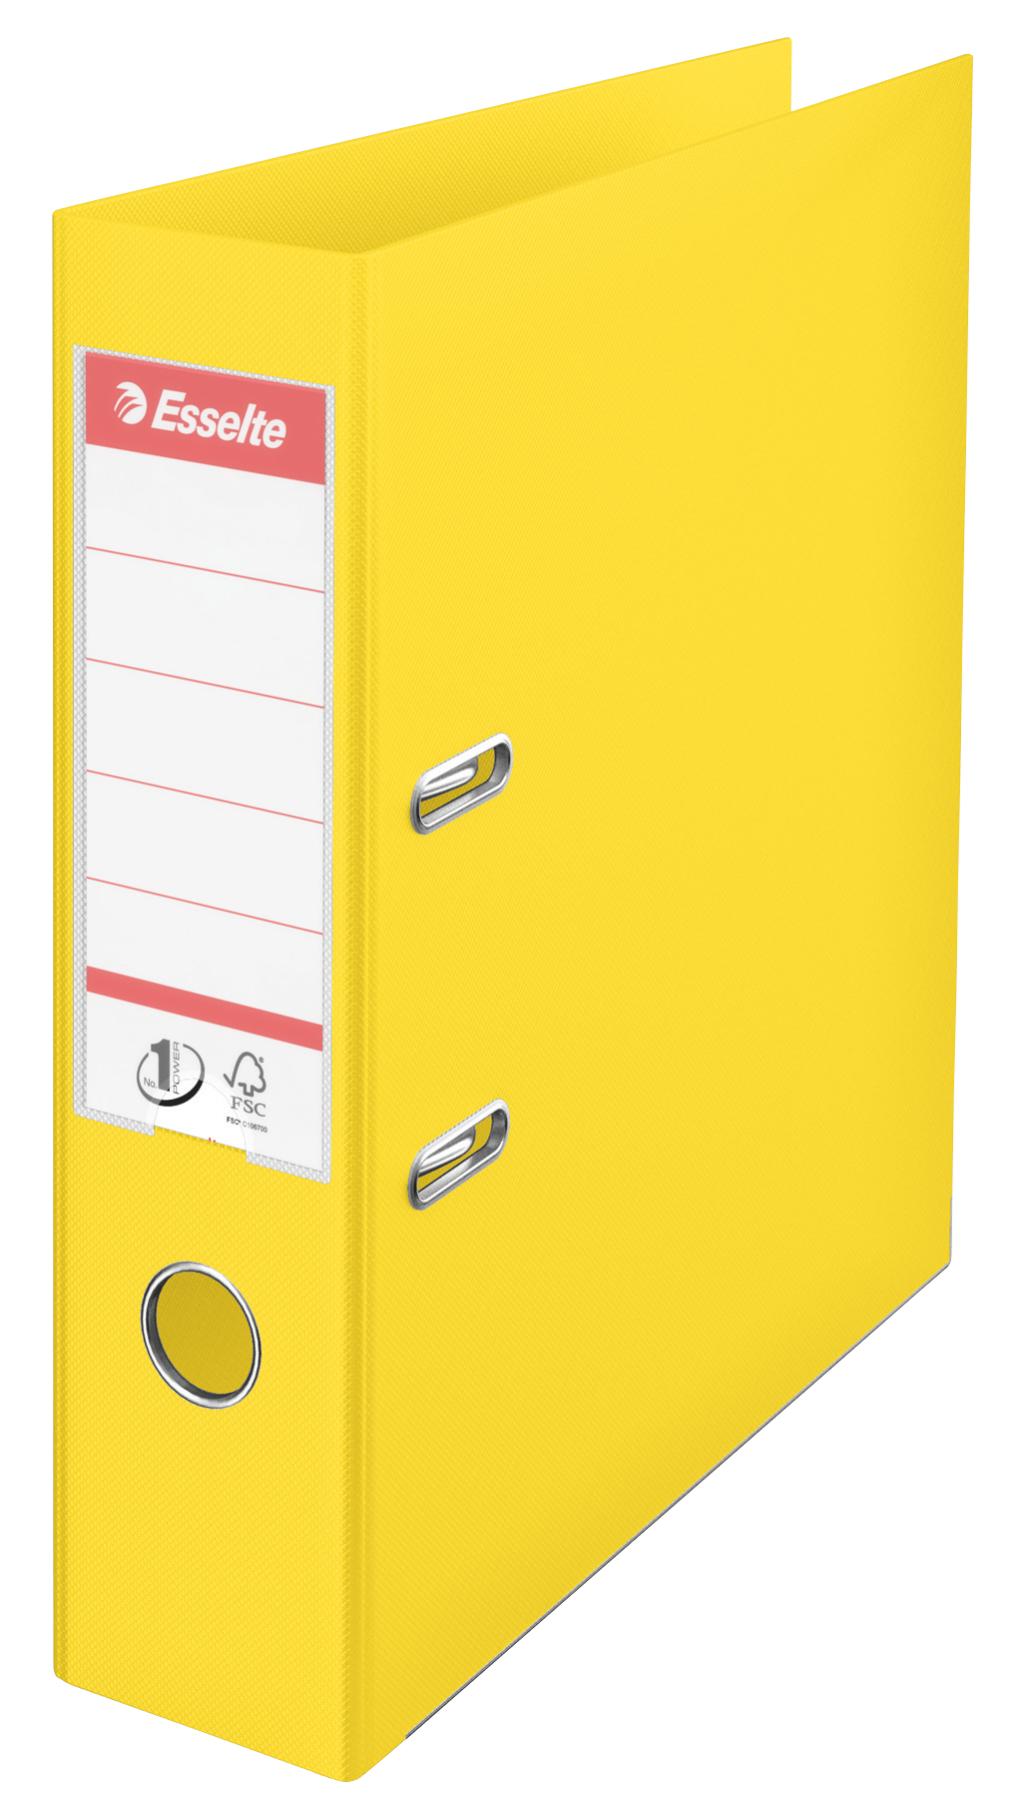 Esselte No.1 VIVIDA Lever Arch File Polypropylene A4 75mm Spine Width Yellow (Pack 10) 624070